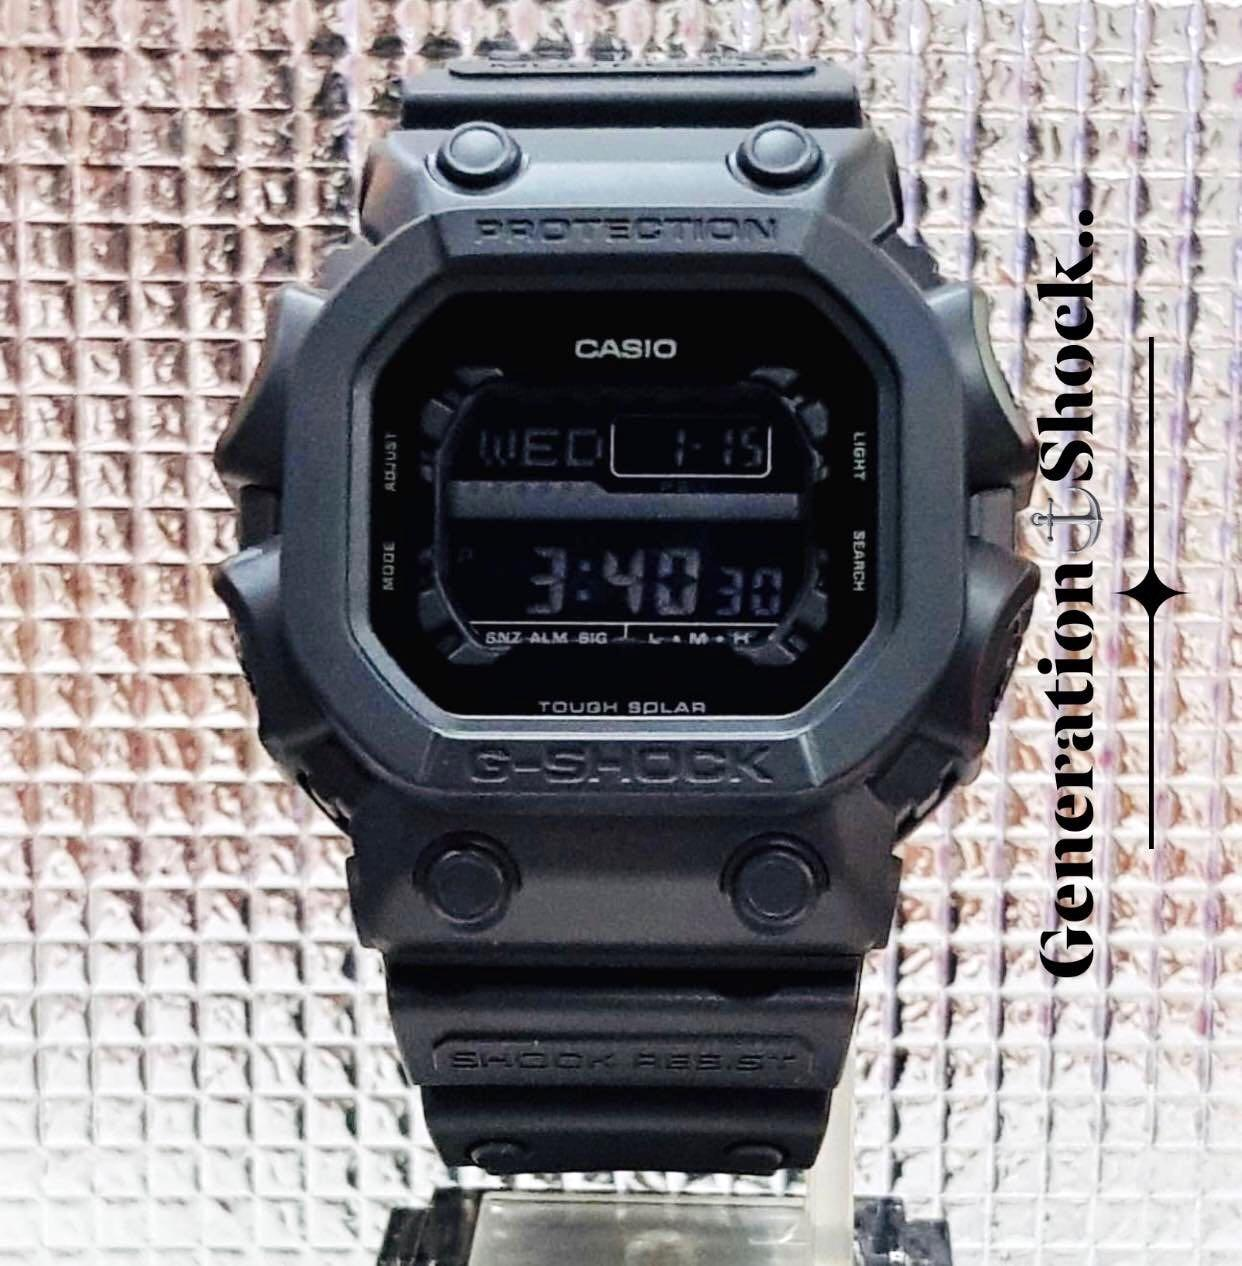 NEW🌟TOUGH☀️SOLAR : G-KING GSHOCK DIVER SPORTS WATCH : 100% ORIGINAL AUTHENTIC CASIO G-SHOCK GKING : GX-56BB-1 / GX56BB-1 / GX-56-BB-1 (DEEP-BLACK STEALTH MATT)